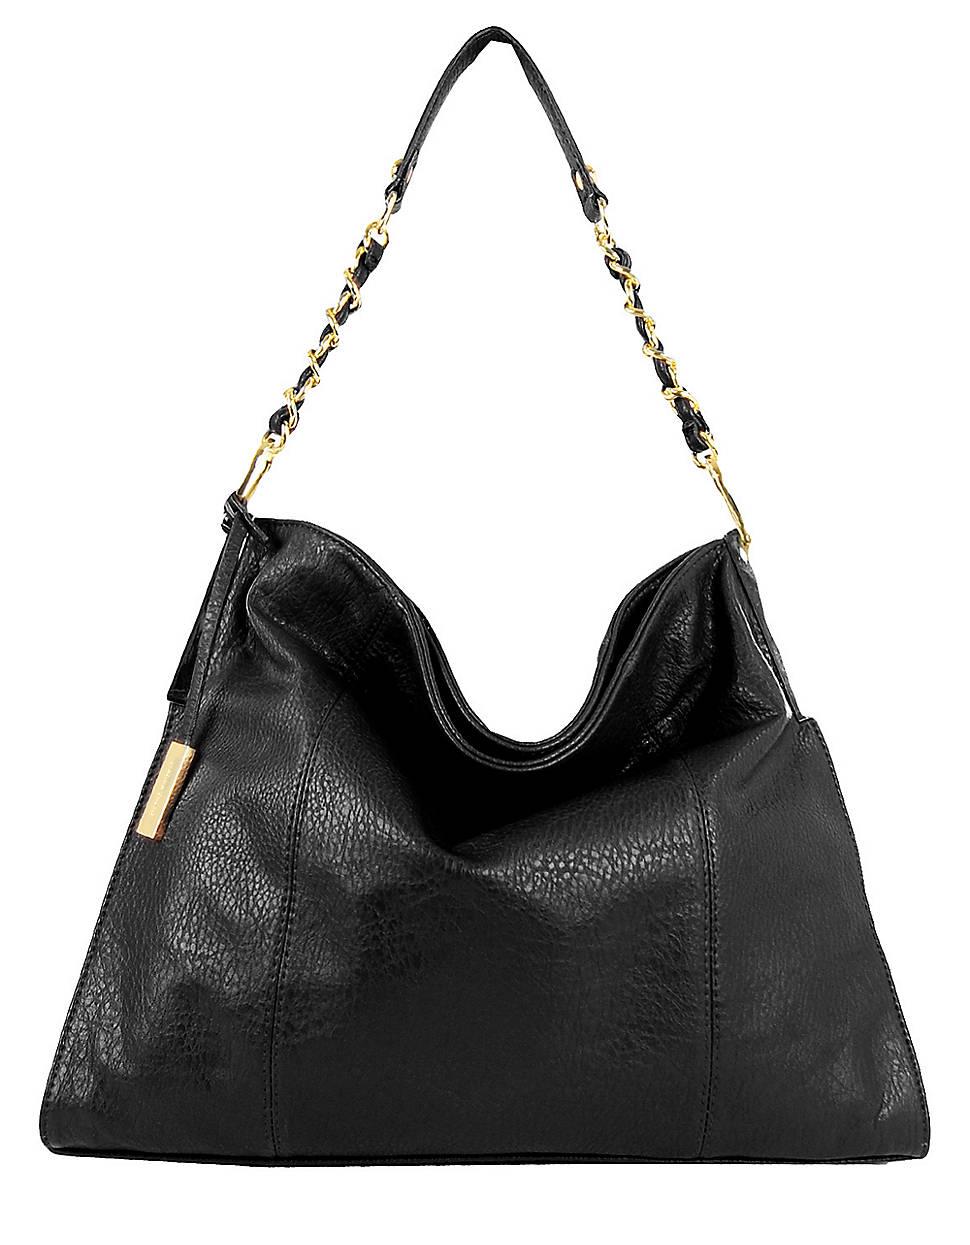 Ivanka Trump Crystal Faux Leather Bucket Hobo Bag in Black | Lyst